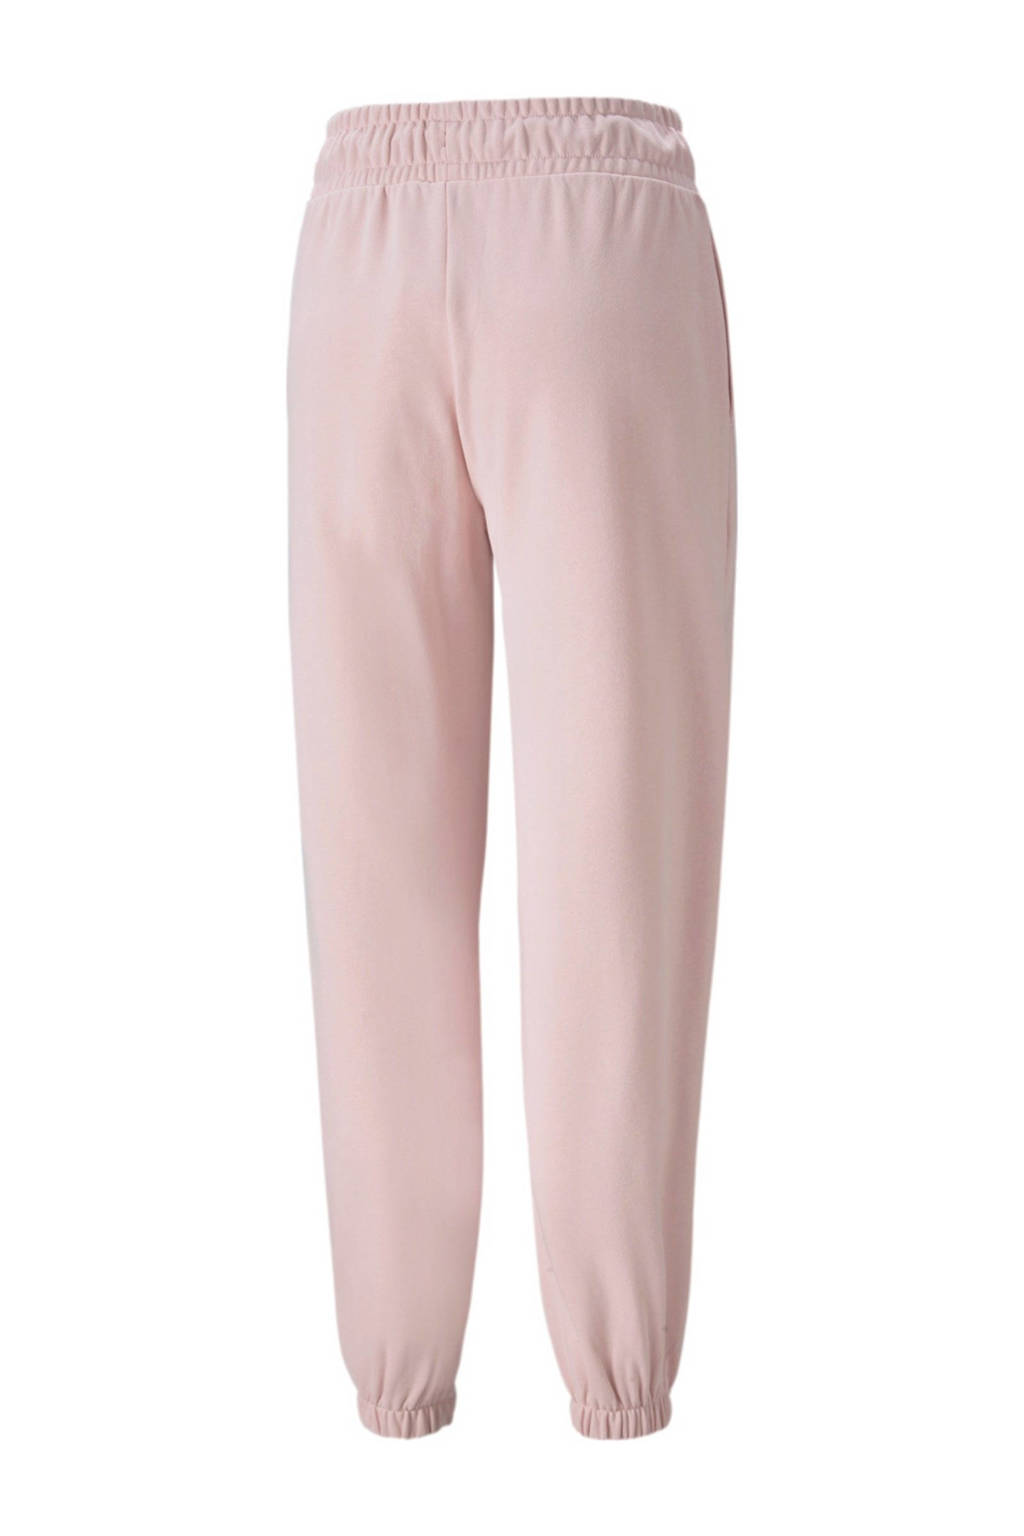 Puma regular fit broek roze, Roze